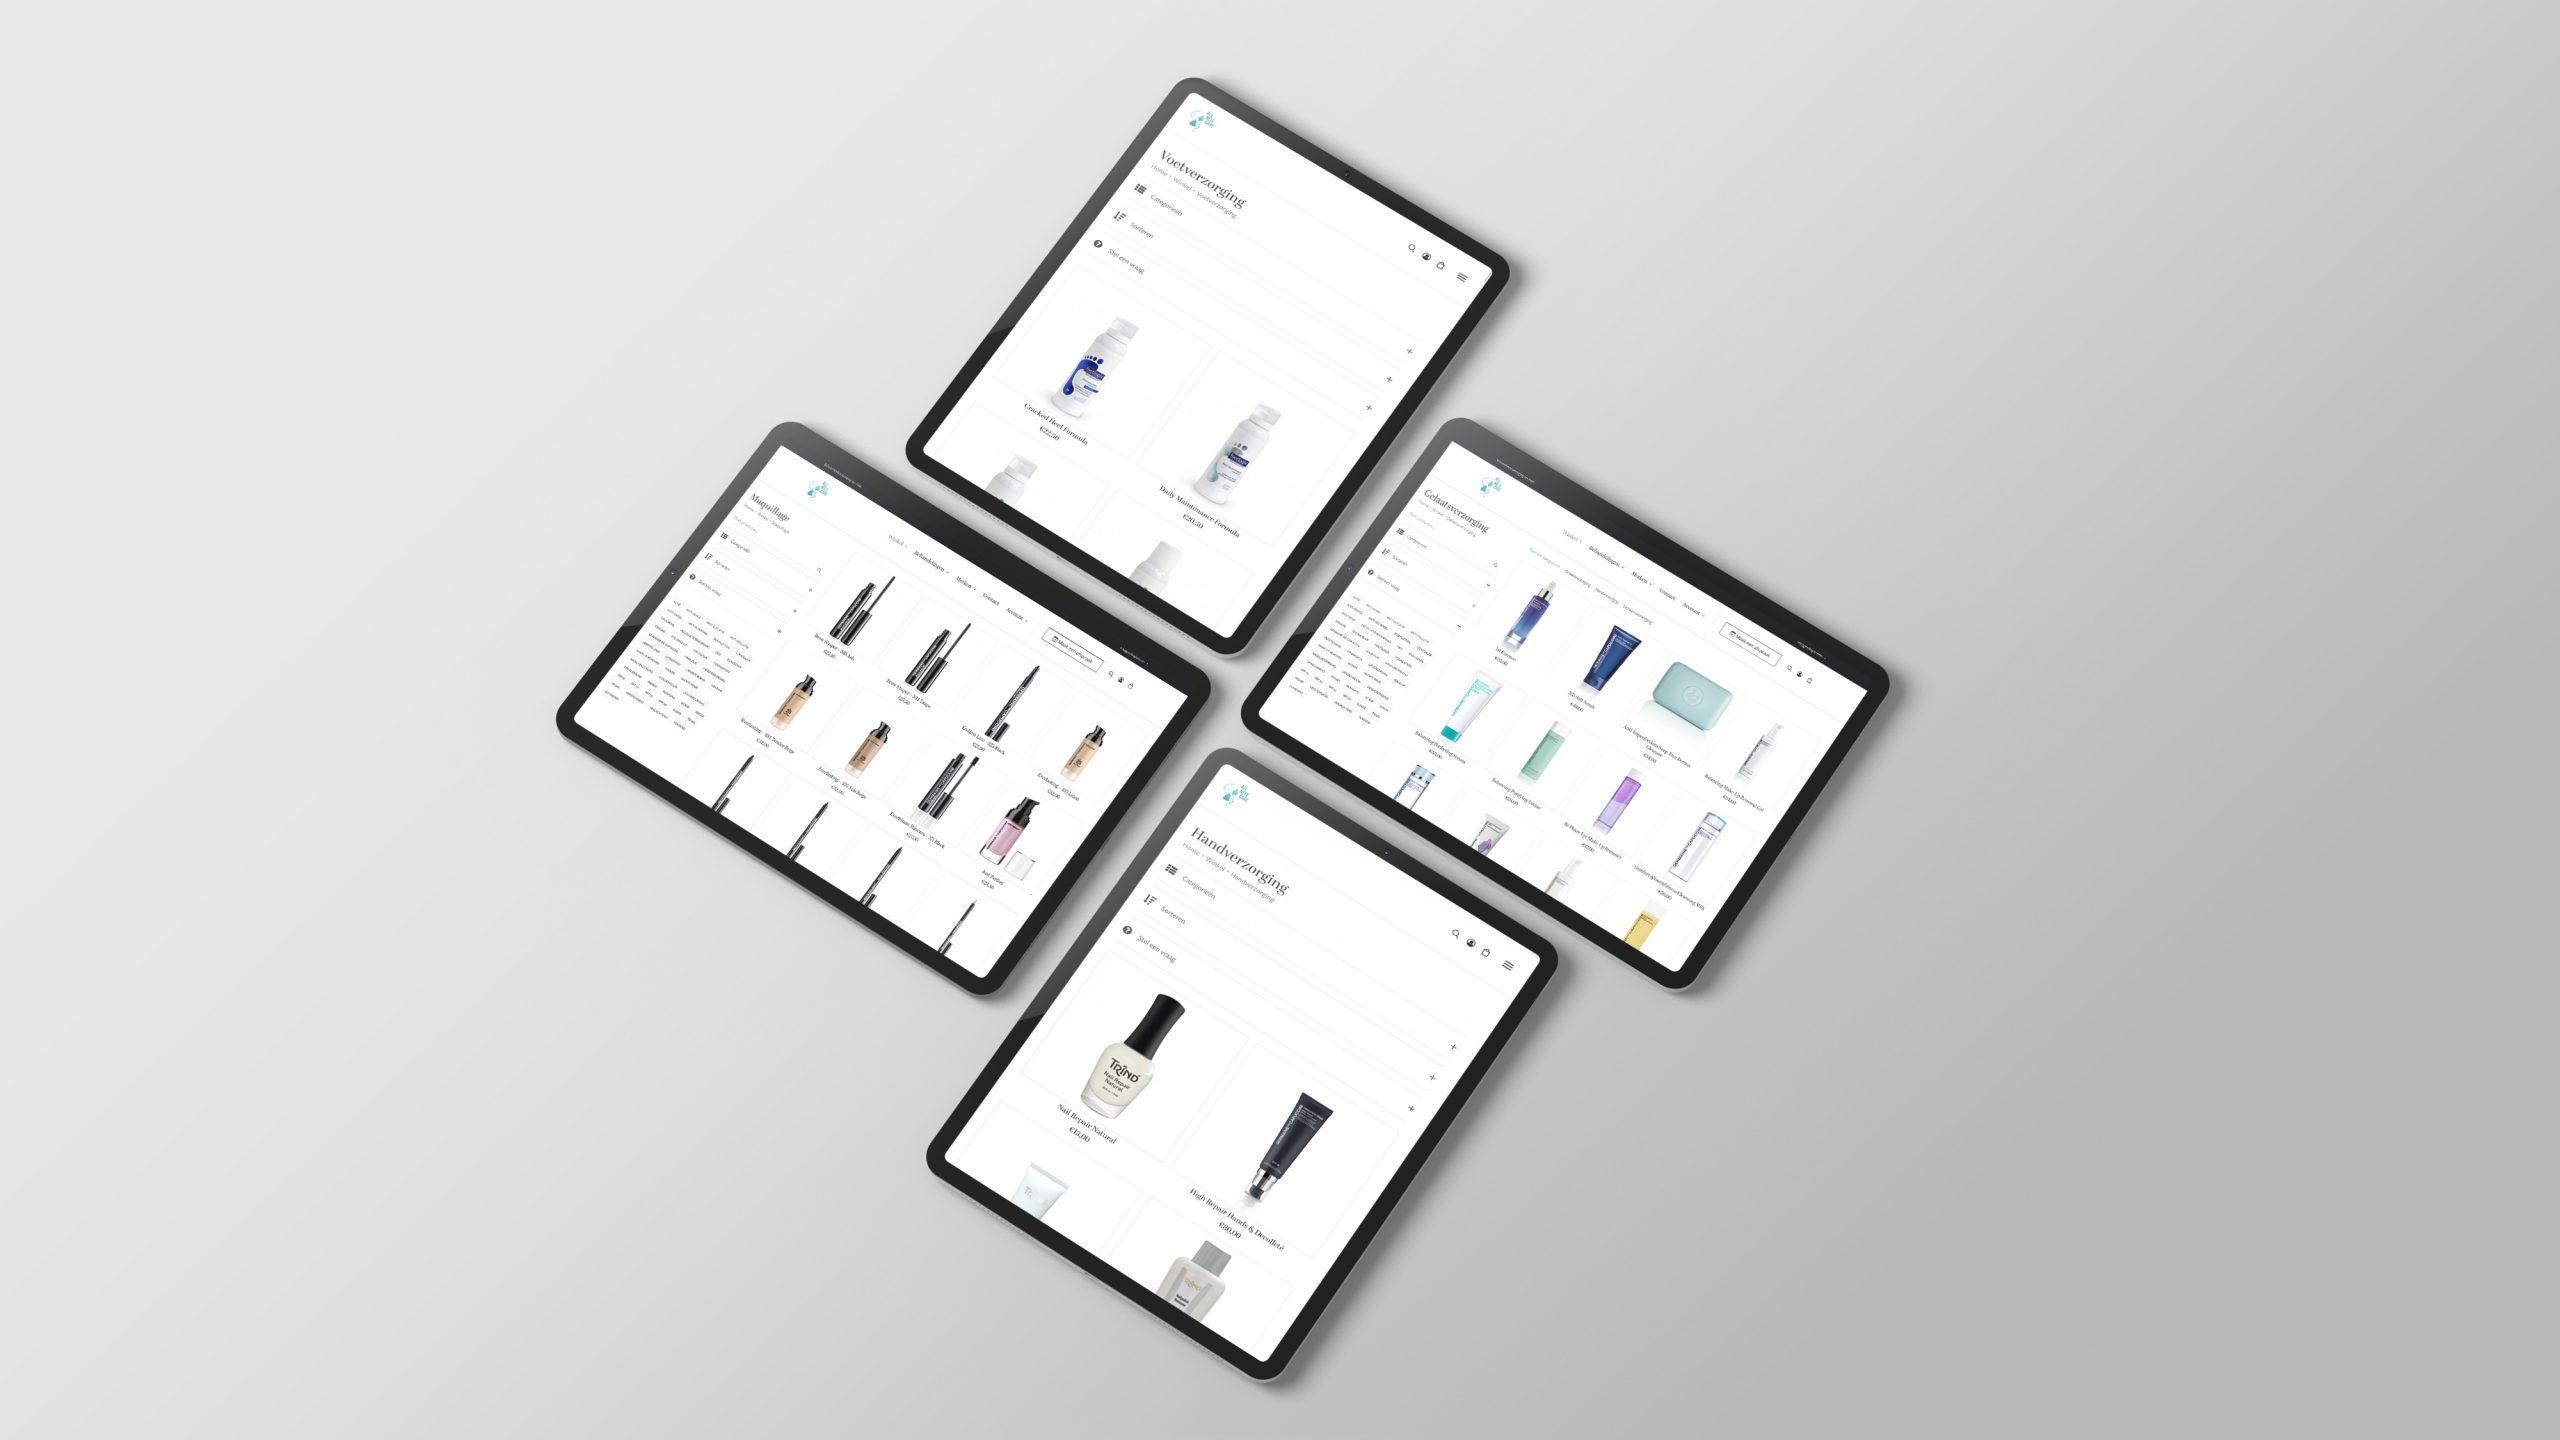 Larkom Webdesign in Londerzeel All Nele Care webshop portfolio 00002 1